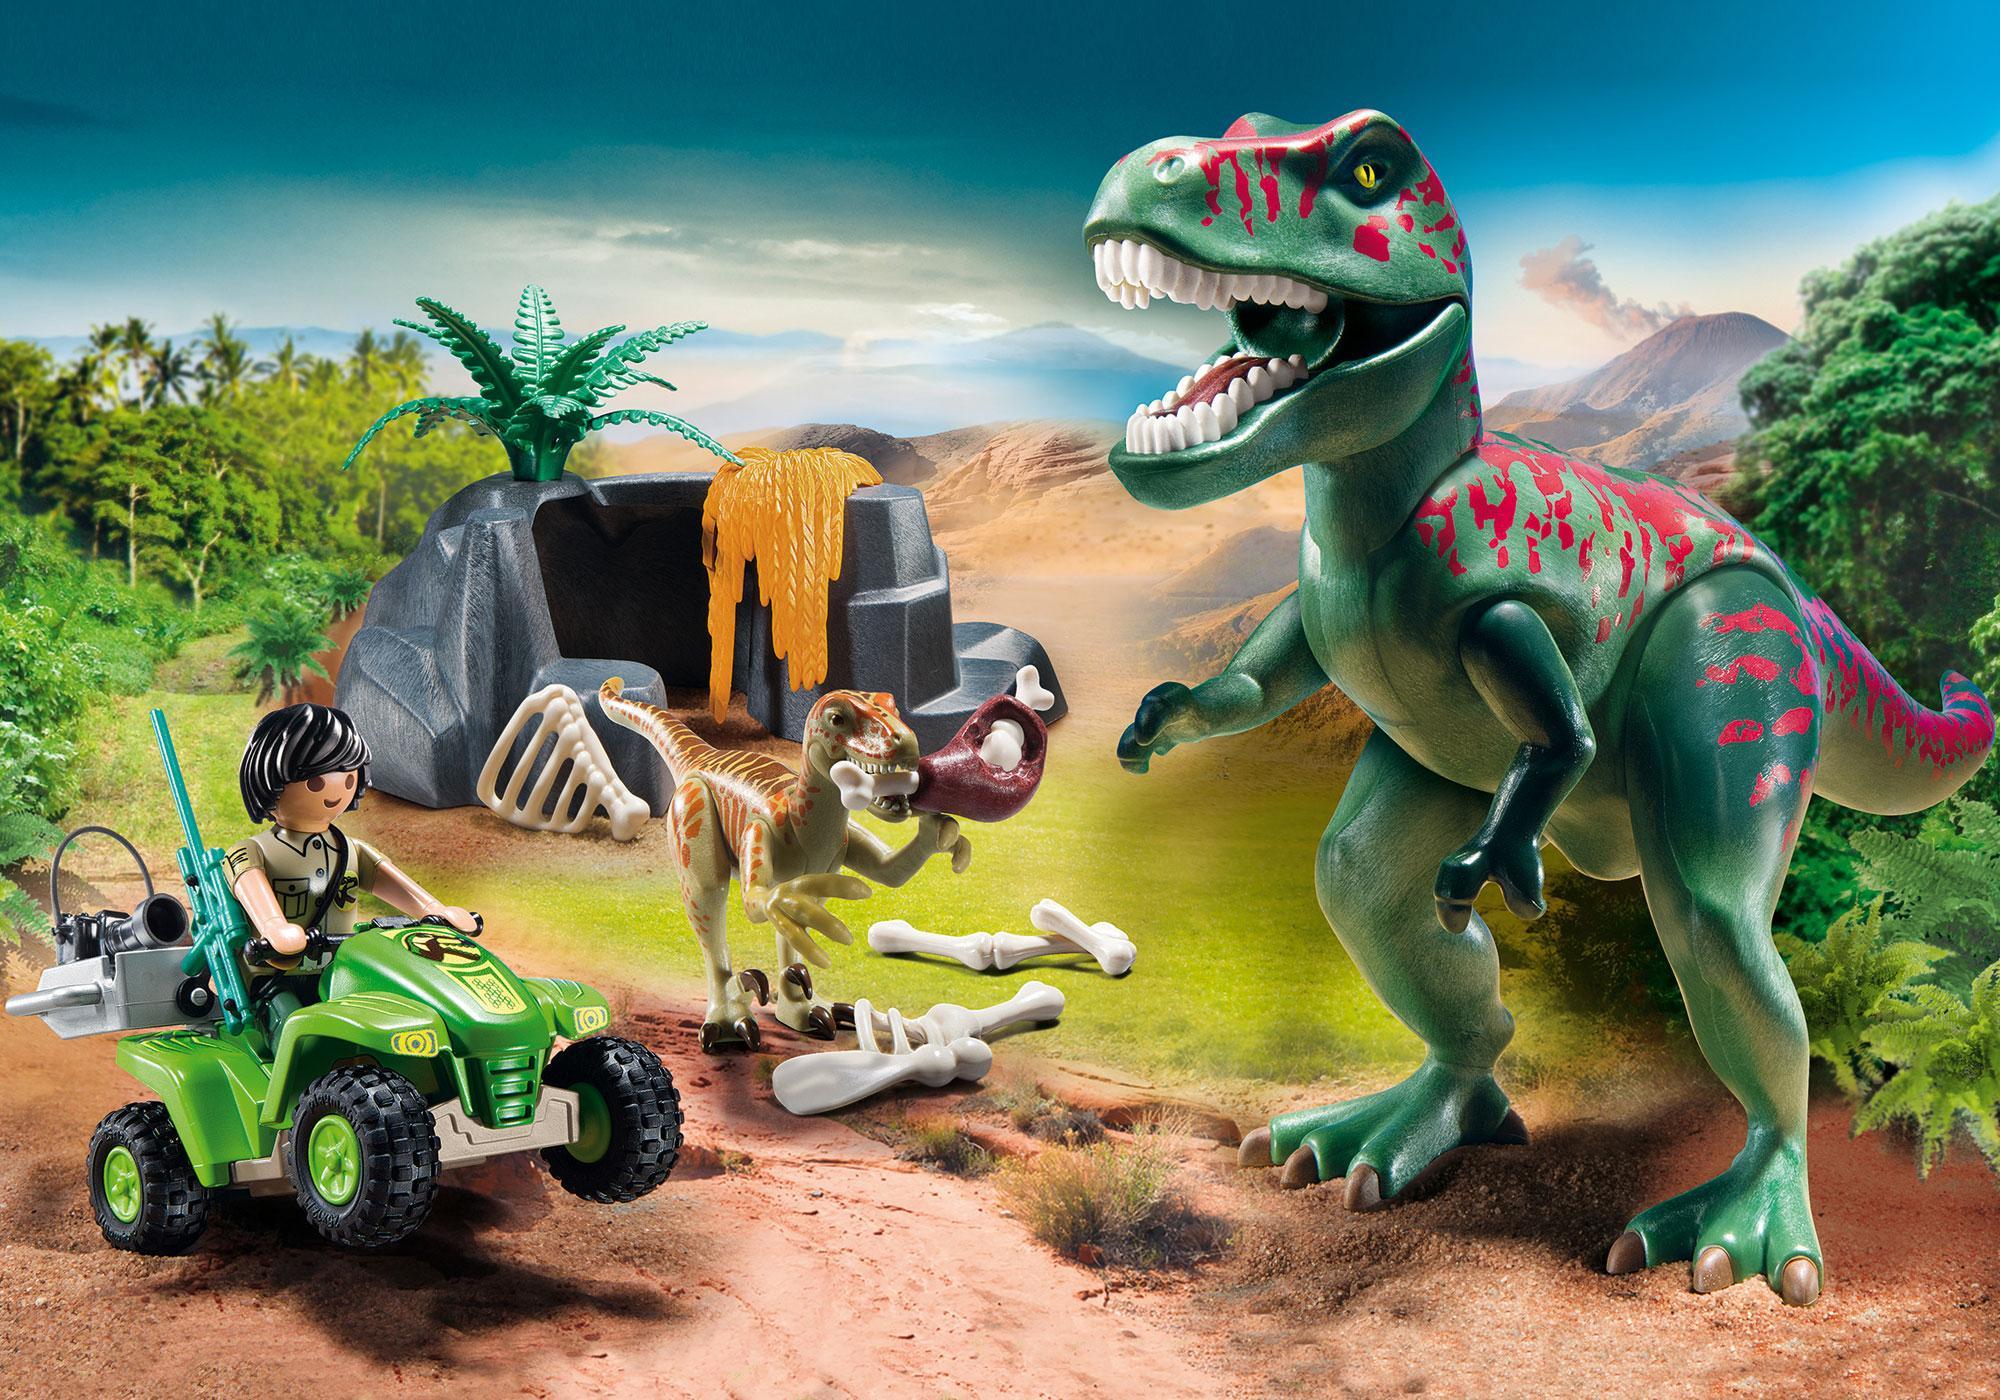 http://media.playmobil.com/i/playmobil/9231_product_detail/Explorer Quad with T-Rex